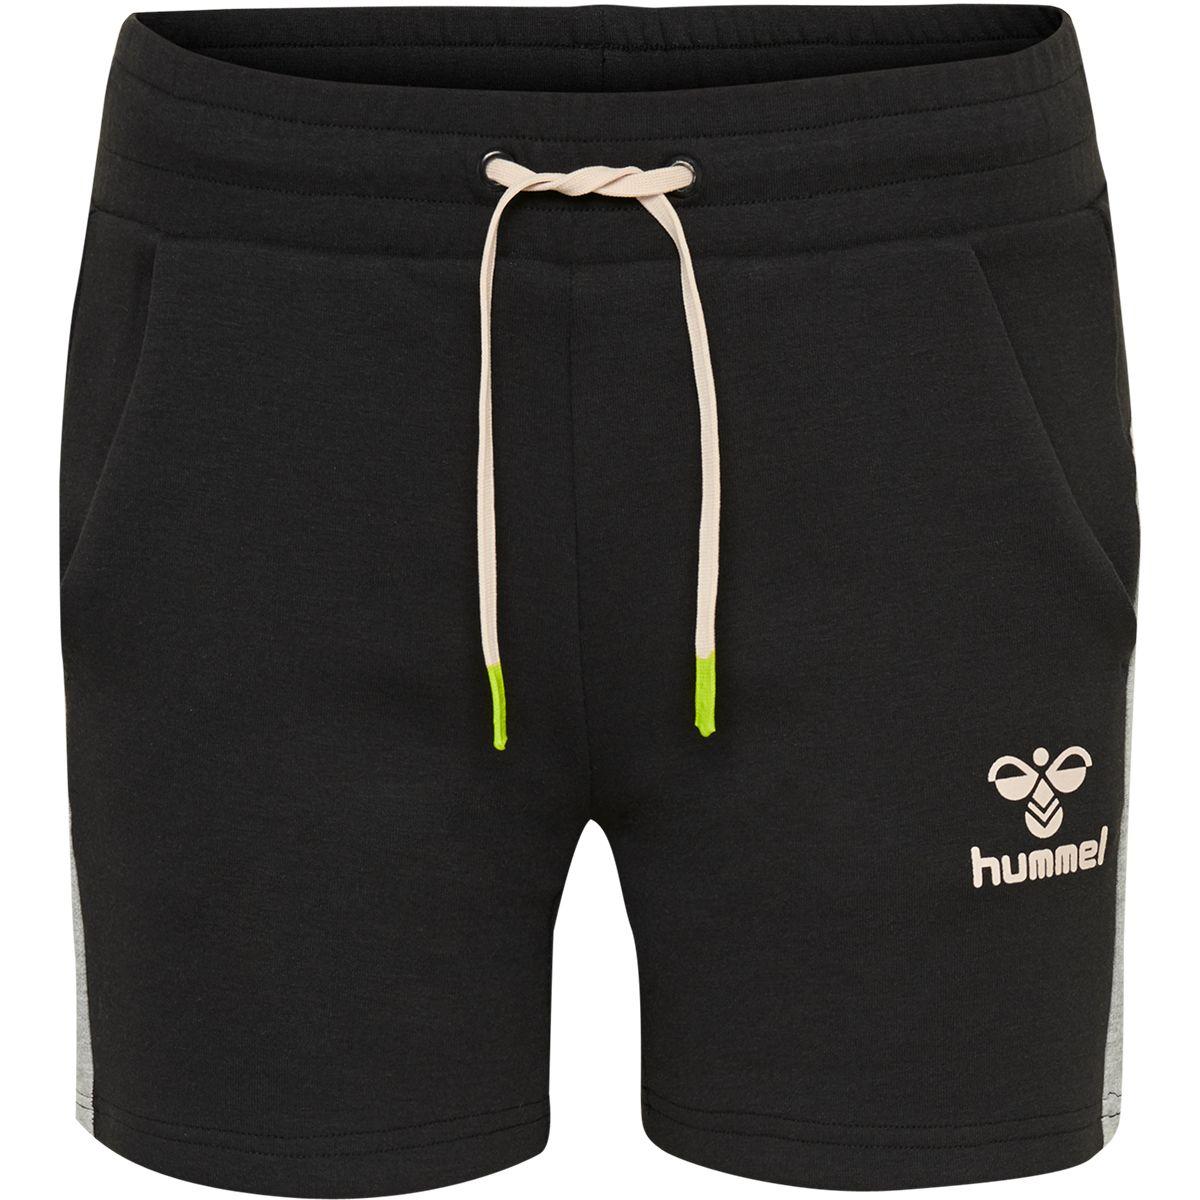 Hummel Nirvana shorts